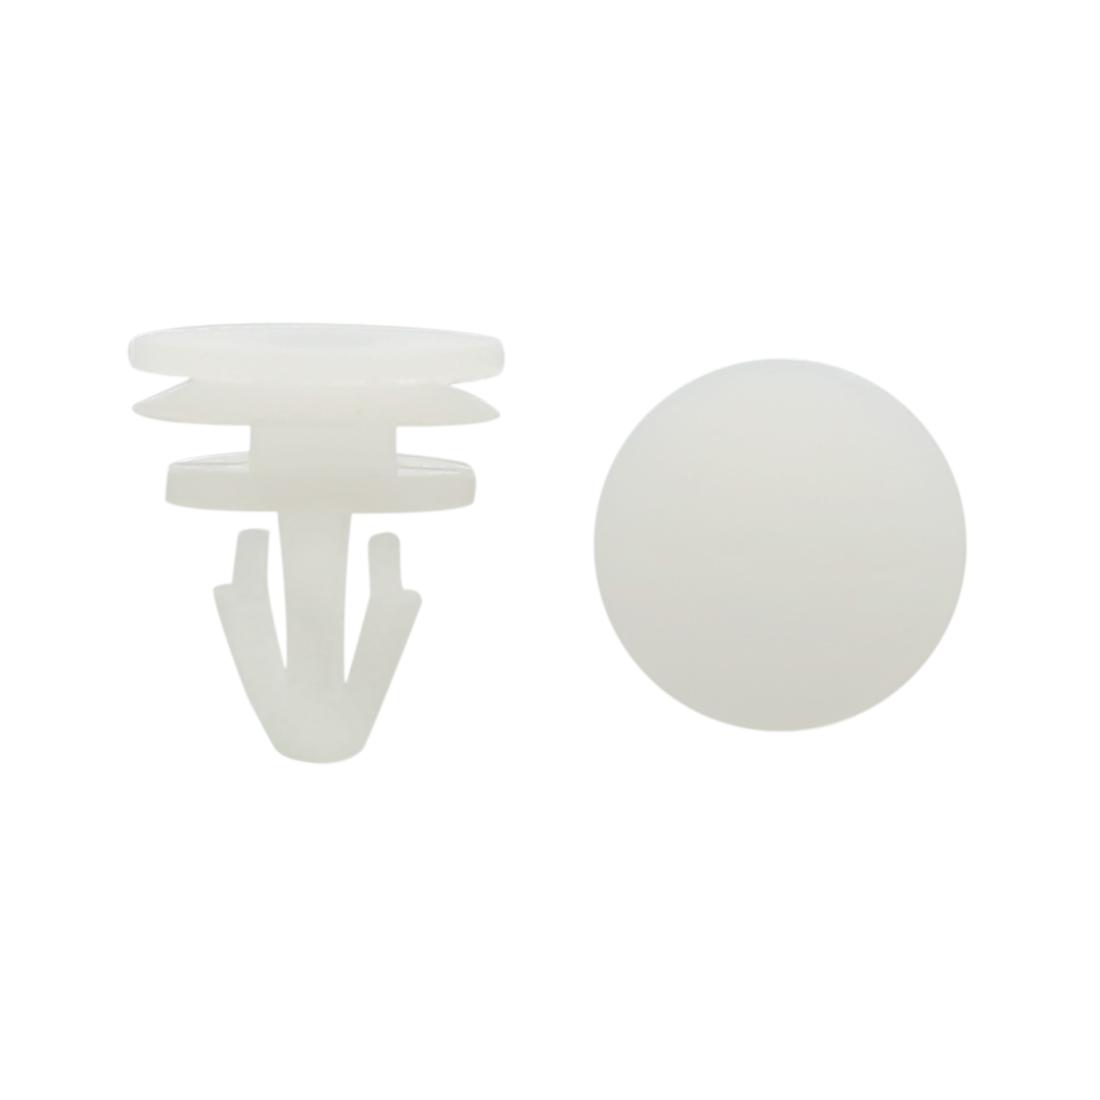 40 Pcs White Plastic Push-Type Bumper Retainer Rivet Clips 7mm x 9mm x 13mm